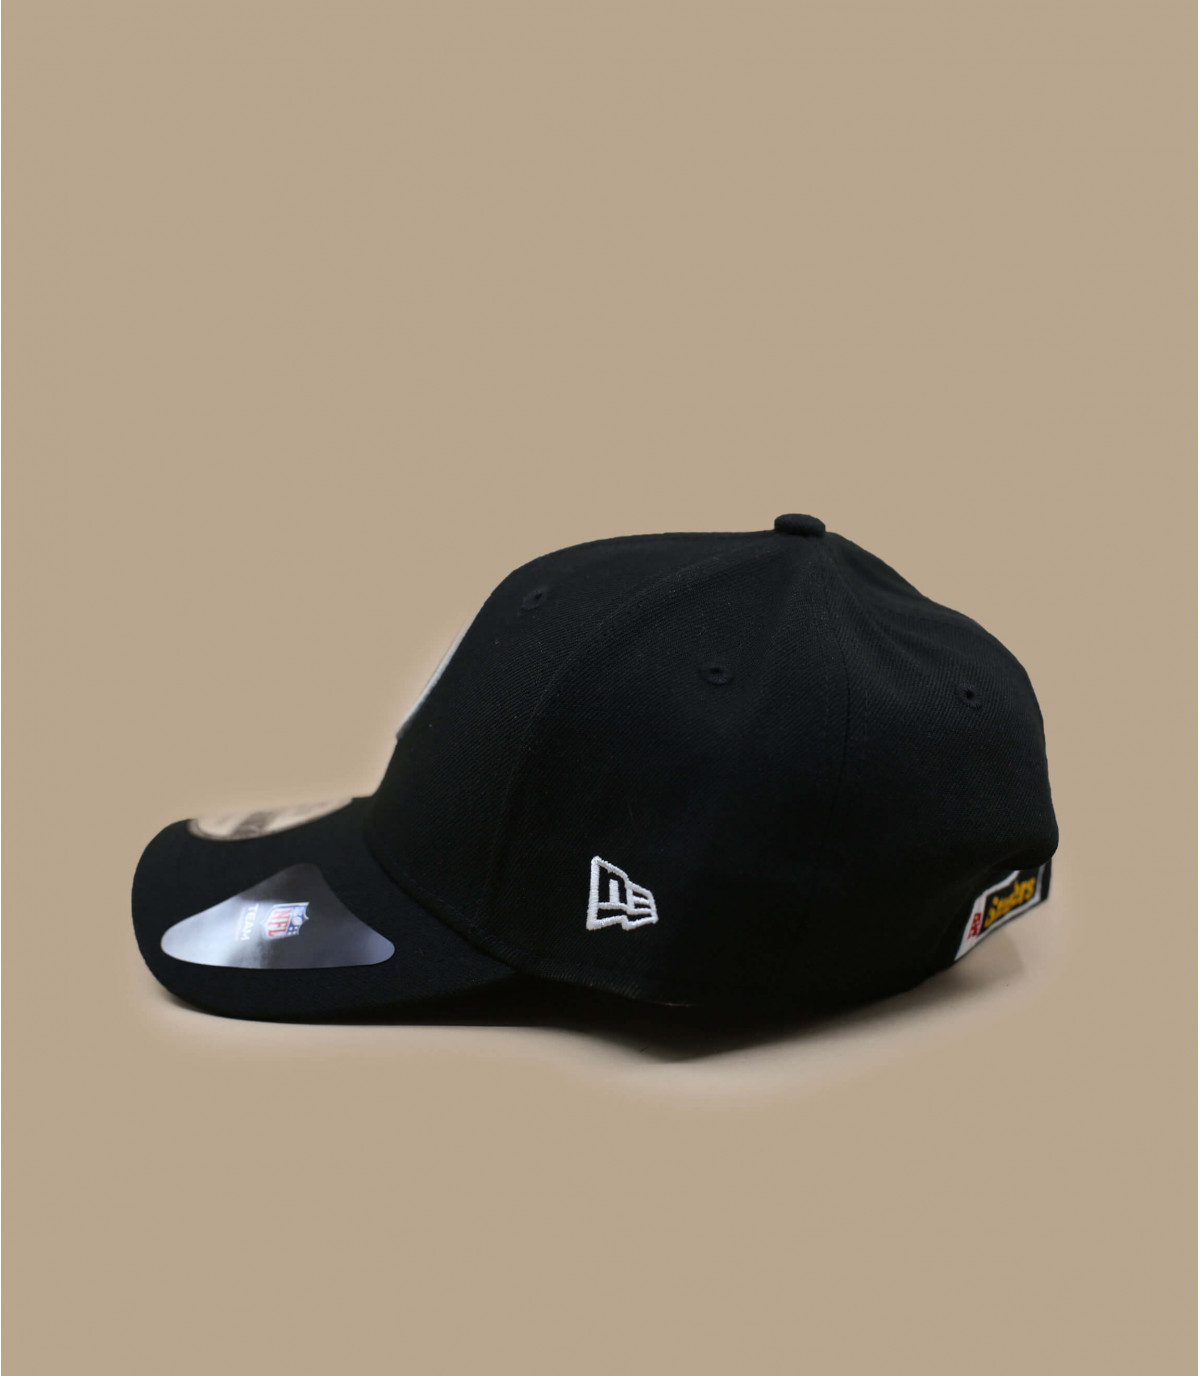 6e29a4de Steelers black curve cap - NFL The League Steelers Team by New Era ...